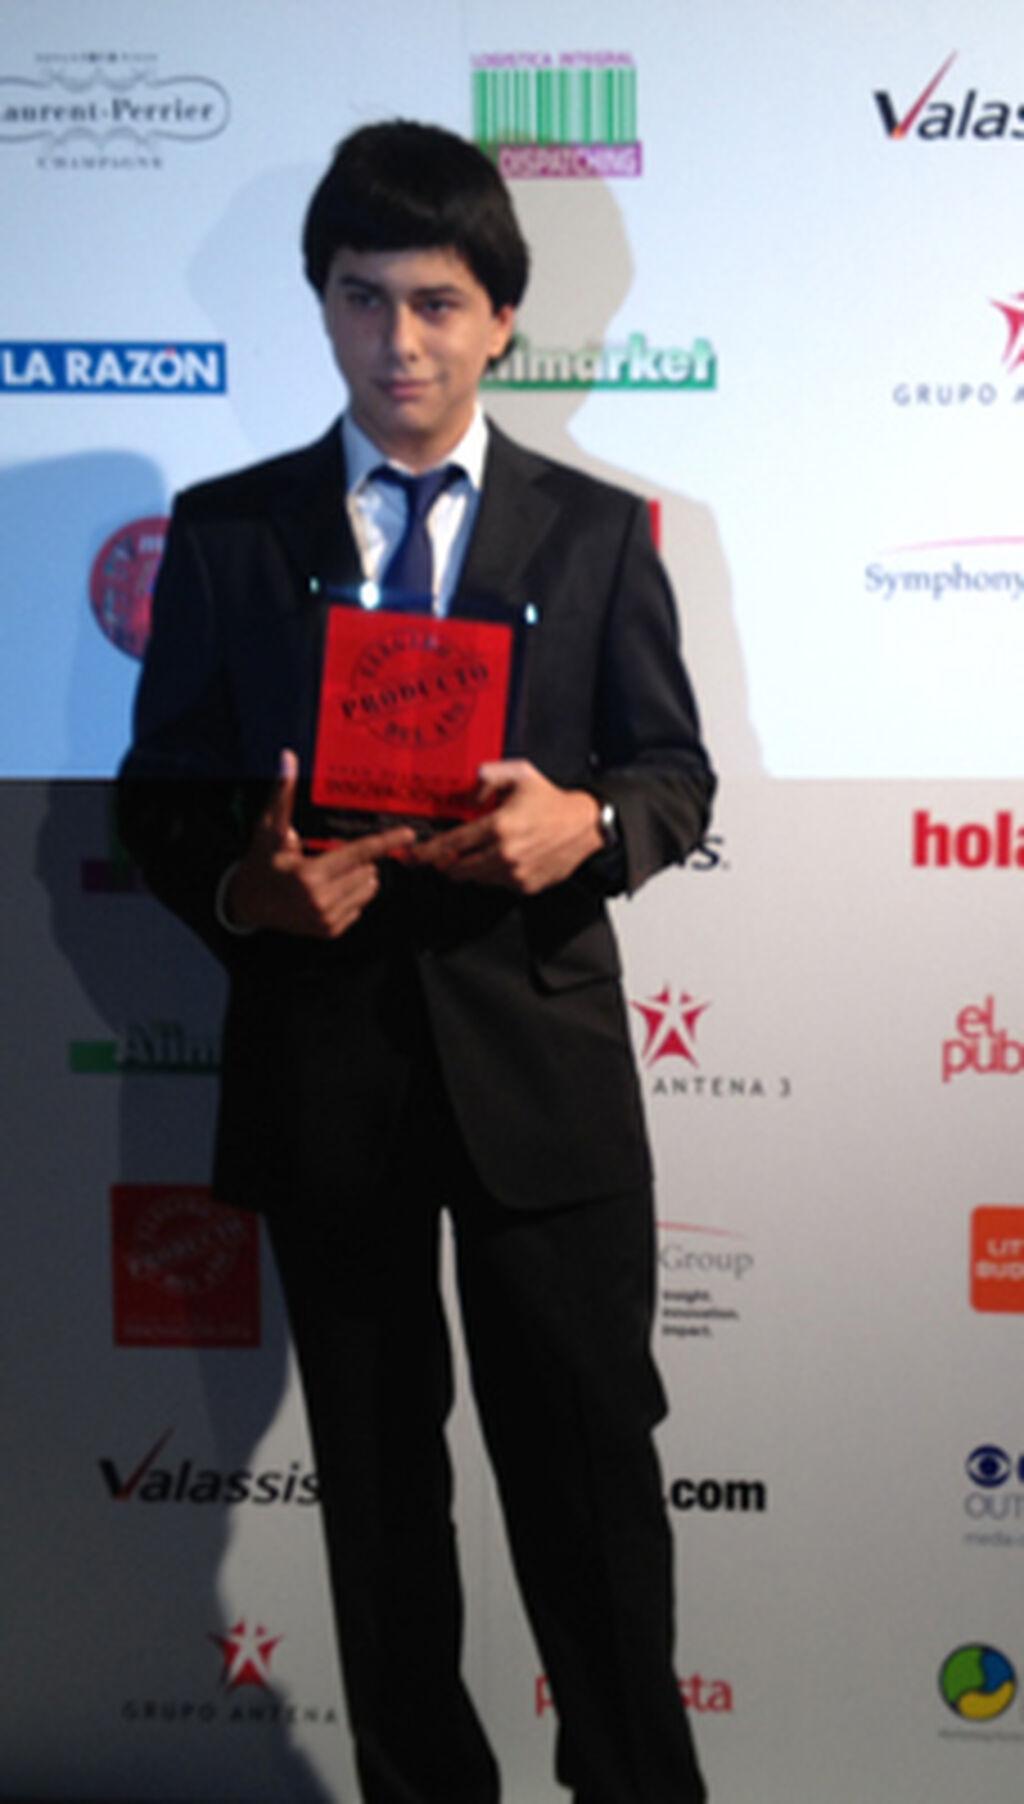 Sergio Schmidt Pérez, Assistant PM de Evax (Arbora & Ausonia). Premio a Evax Cottonlike con Perlas Activas (Higiene Íntima)